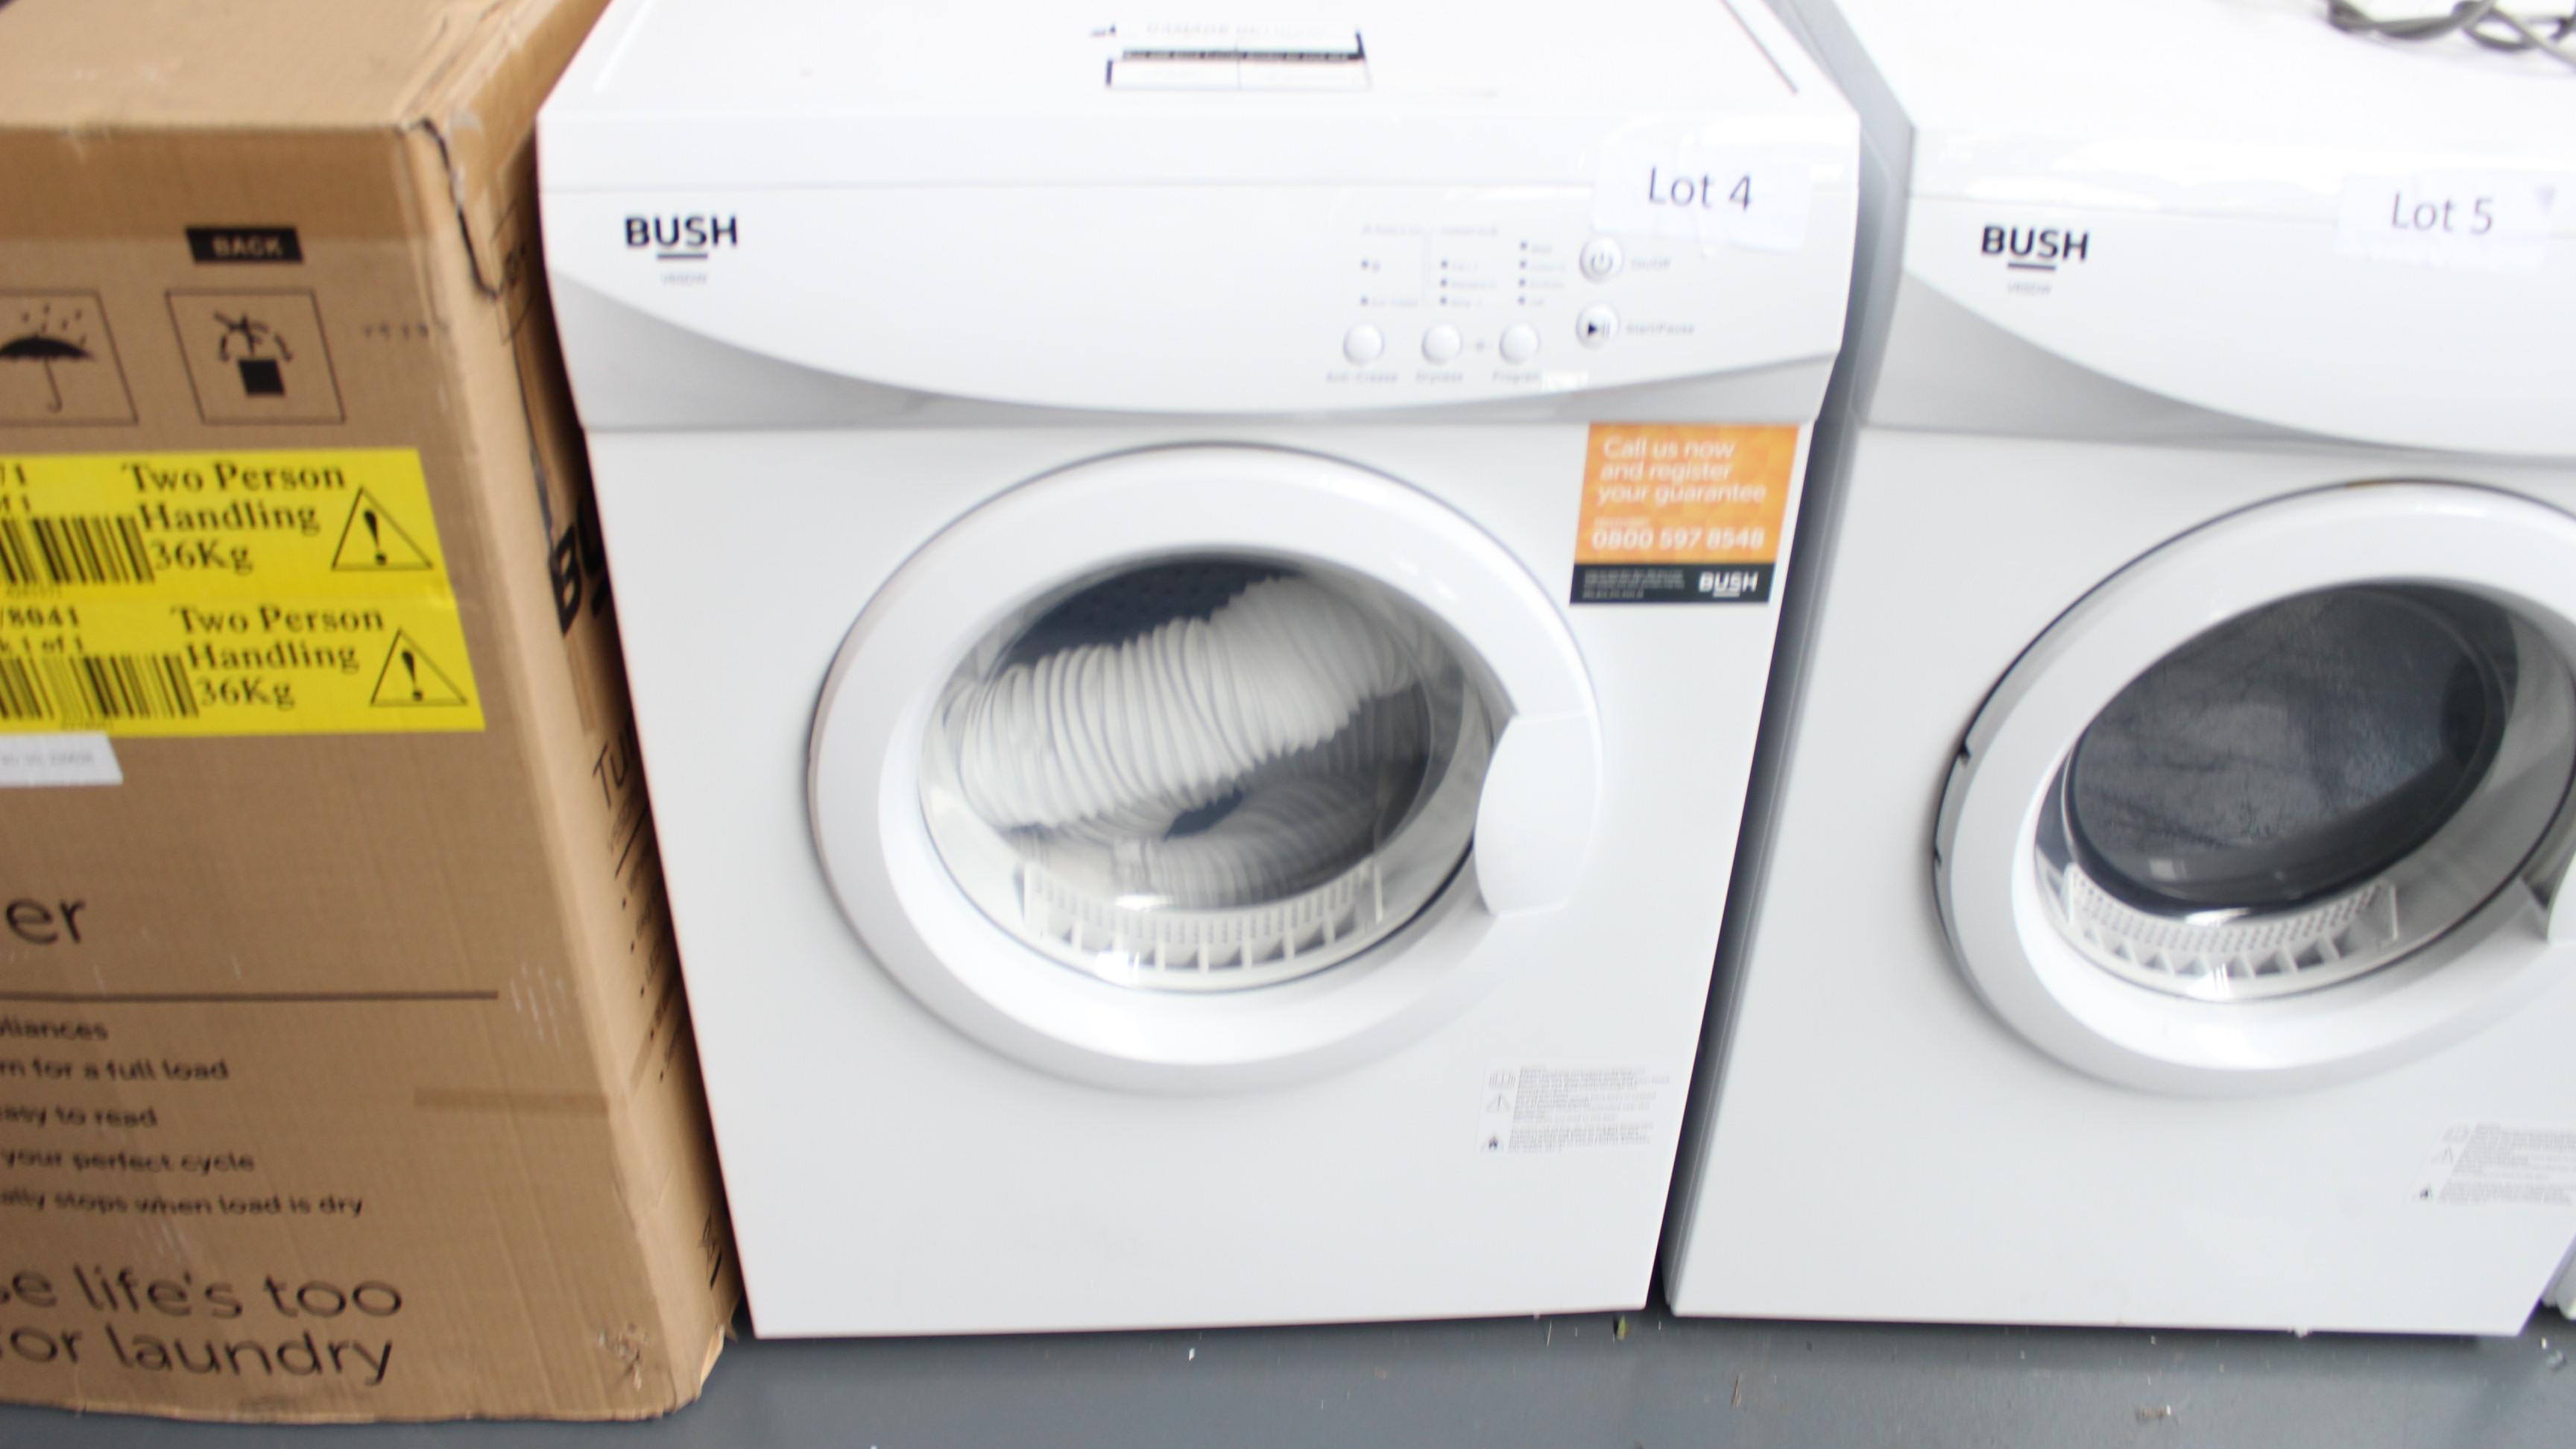 Lot 4 - Bush V6SDW Tumble Dryer Customer Returns